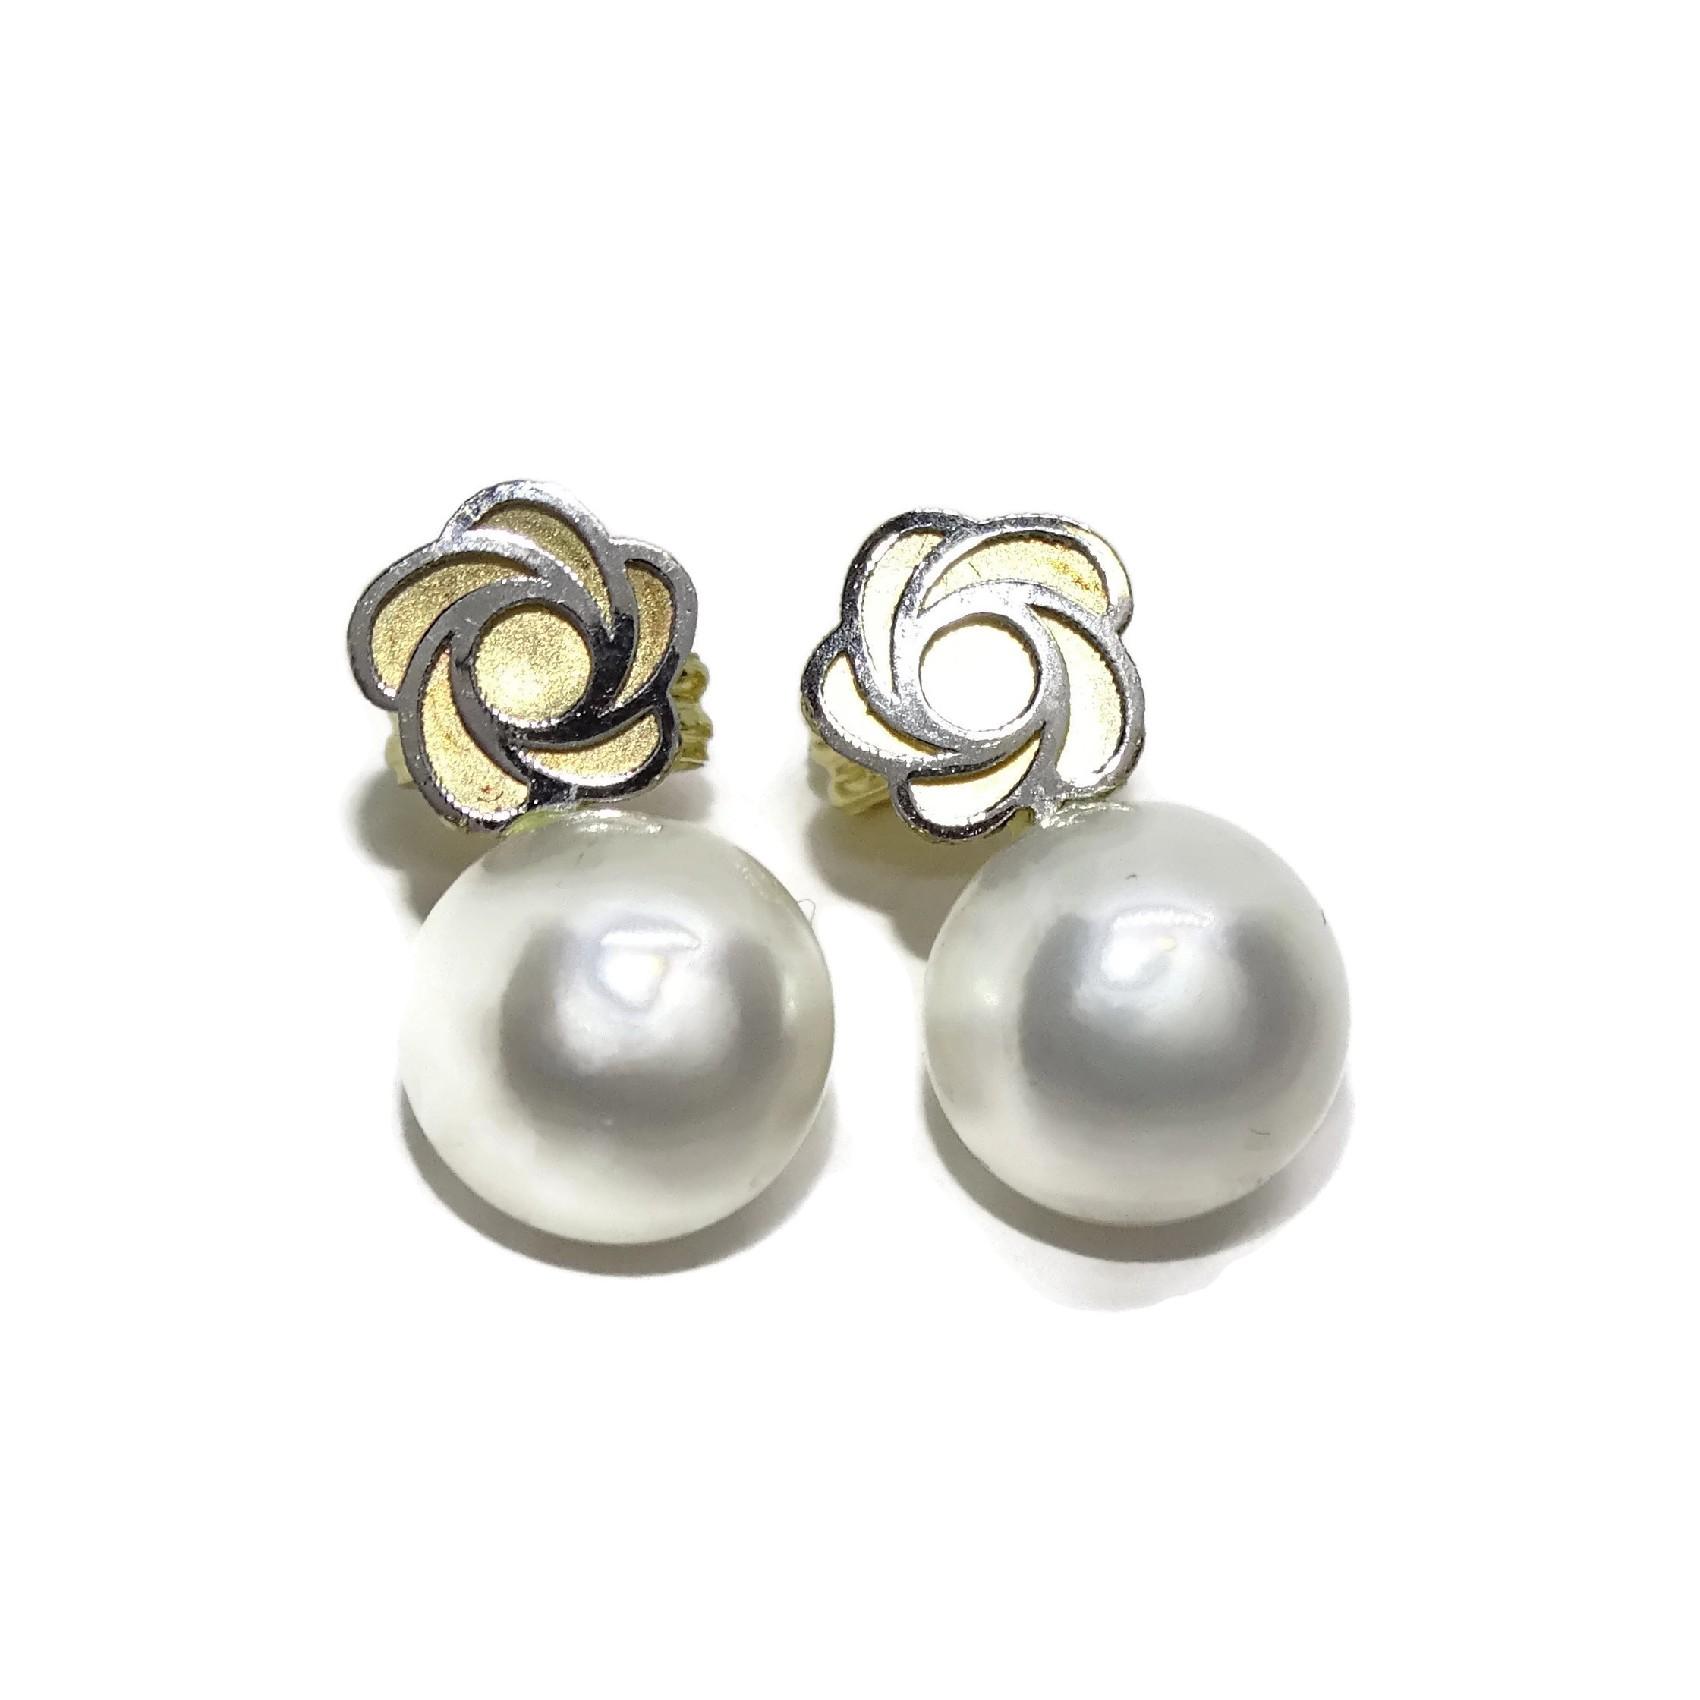 e33a0bdb9ea0 Pendientes    Especial mi 1ª comunión   de oro de 18ktes con perla  cultivadas